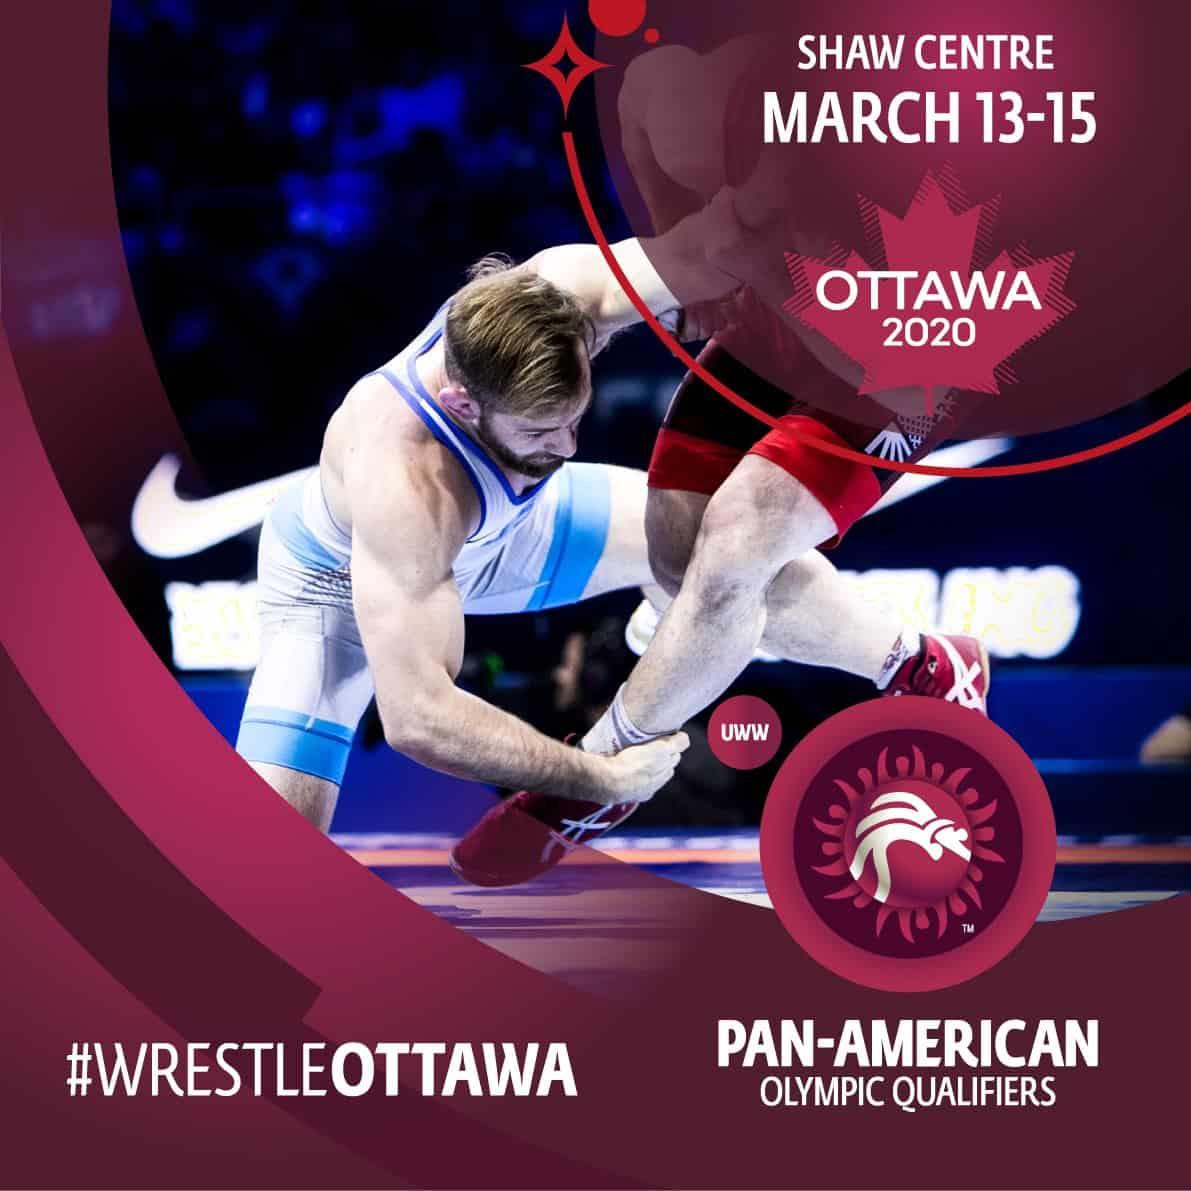 Pan-American OG Qualifier, tutti i risultati delle qualificazioni per le Olimpiadi 2